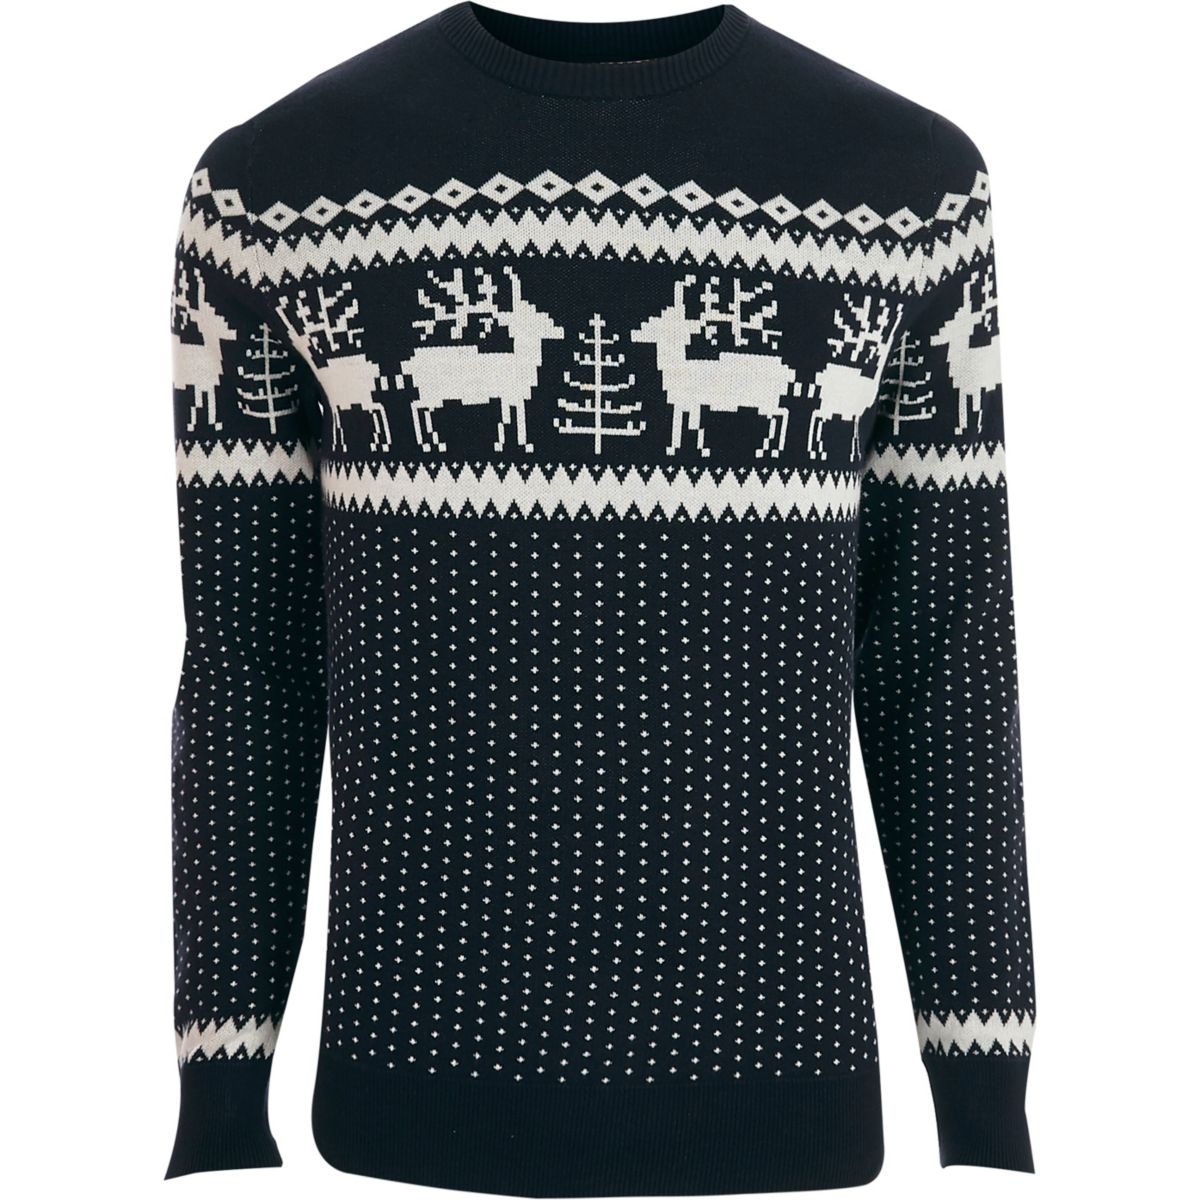 Jack & Jones Premium navy Christmas jumper